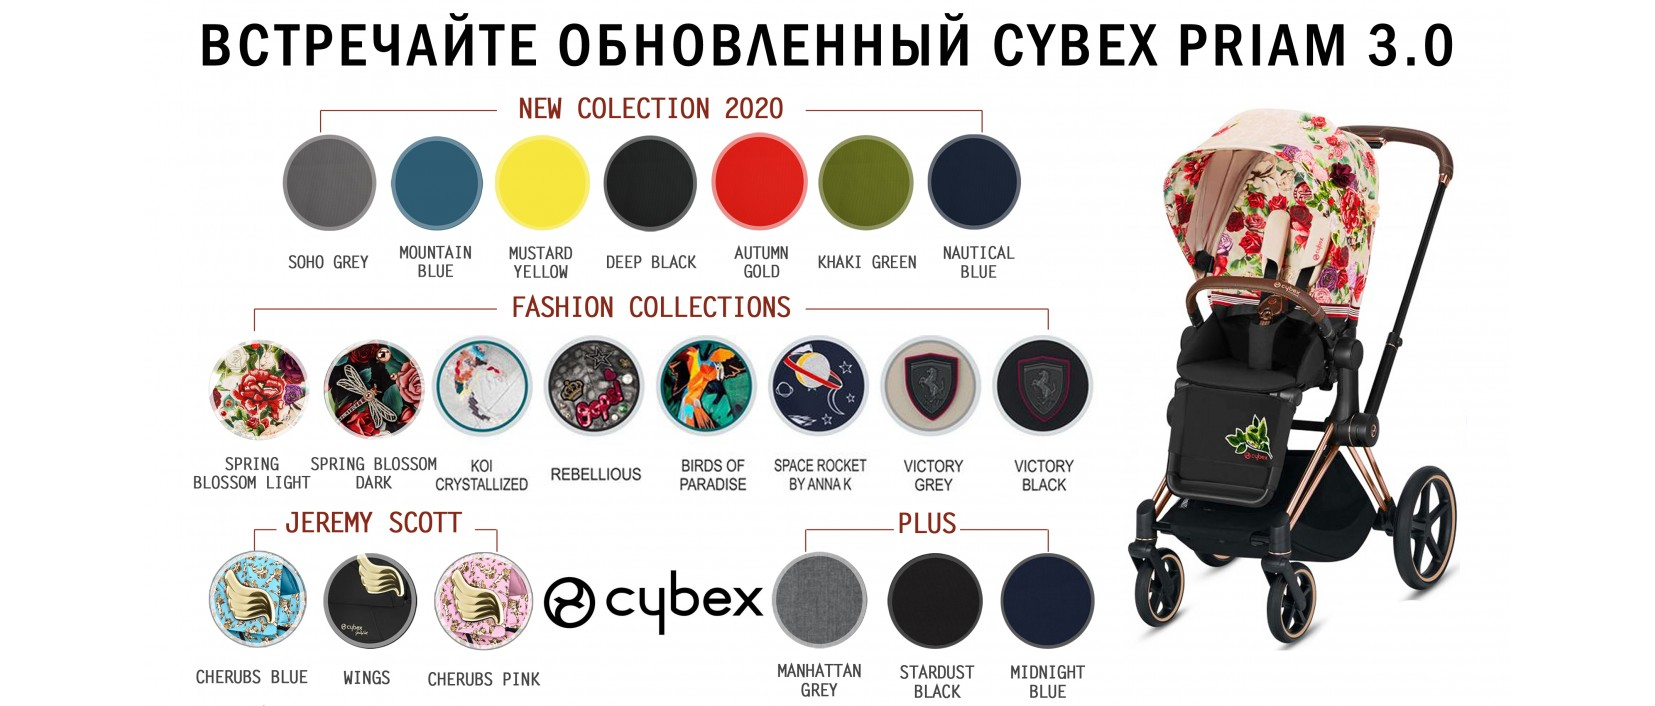 Cybex Priam 2020